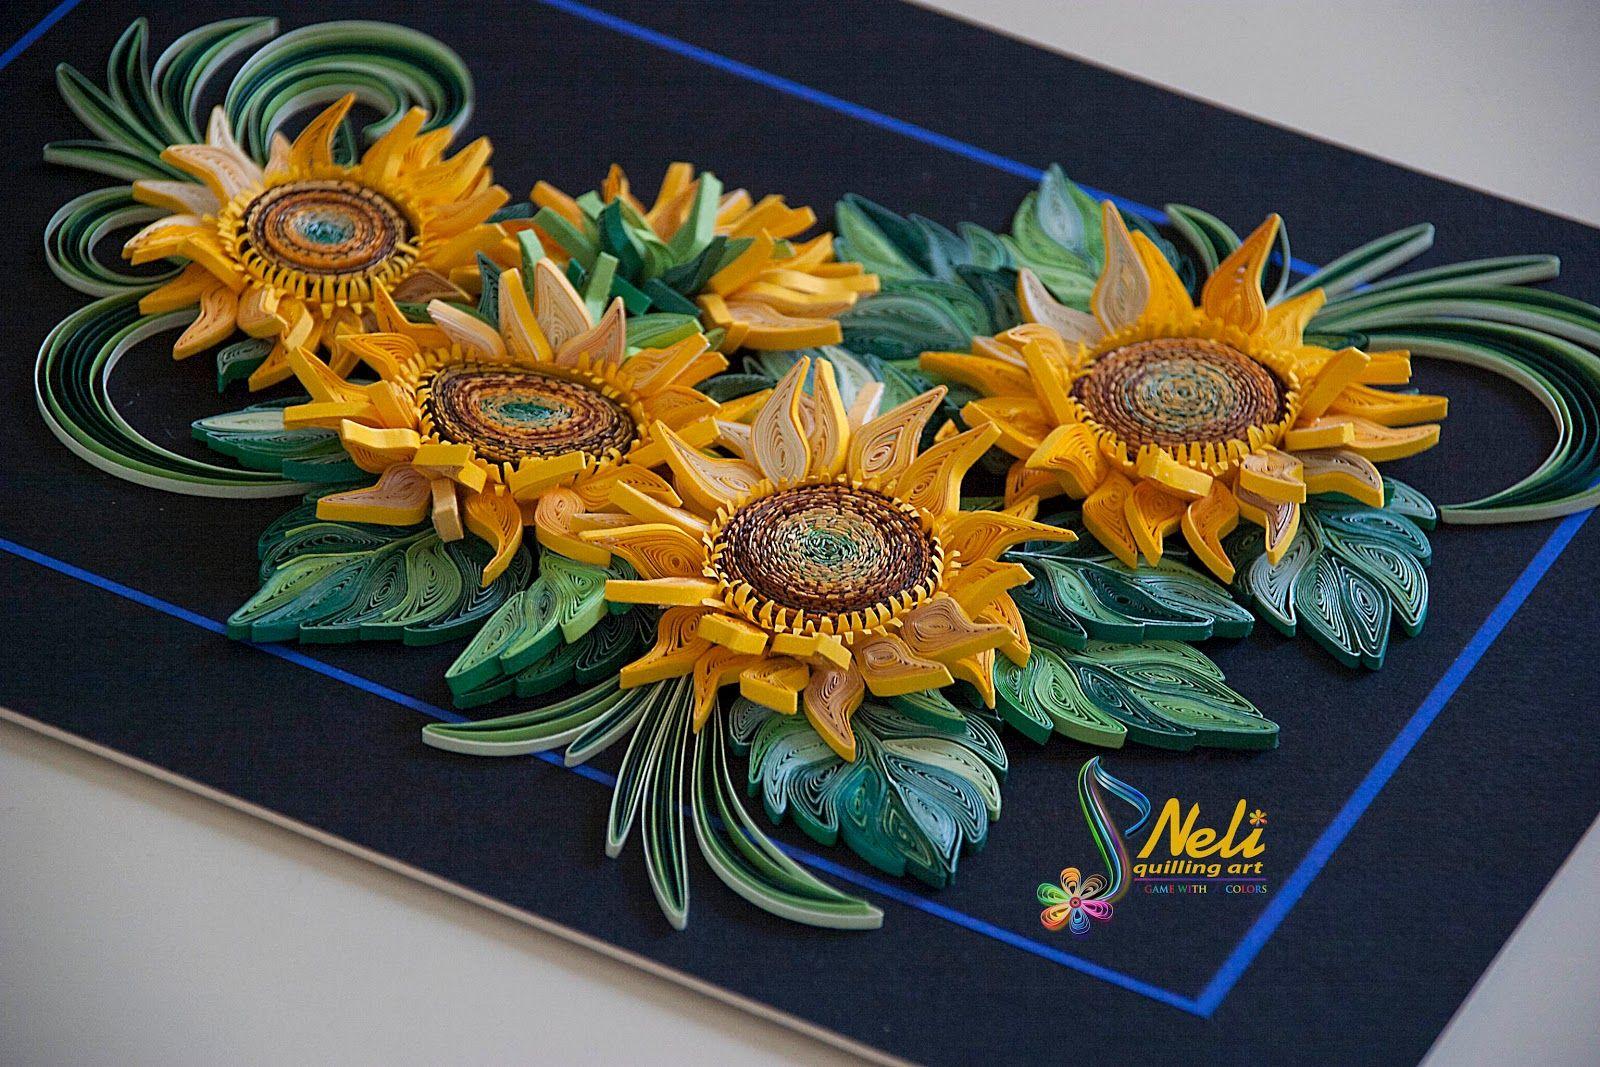 Neli Quilling Art Sunflowers